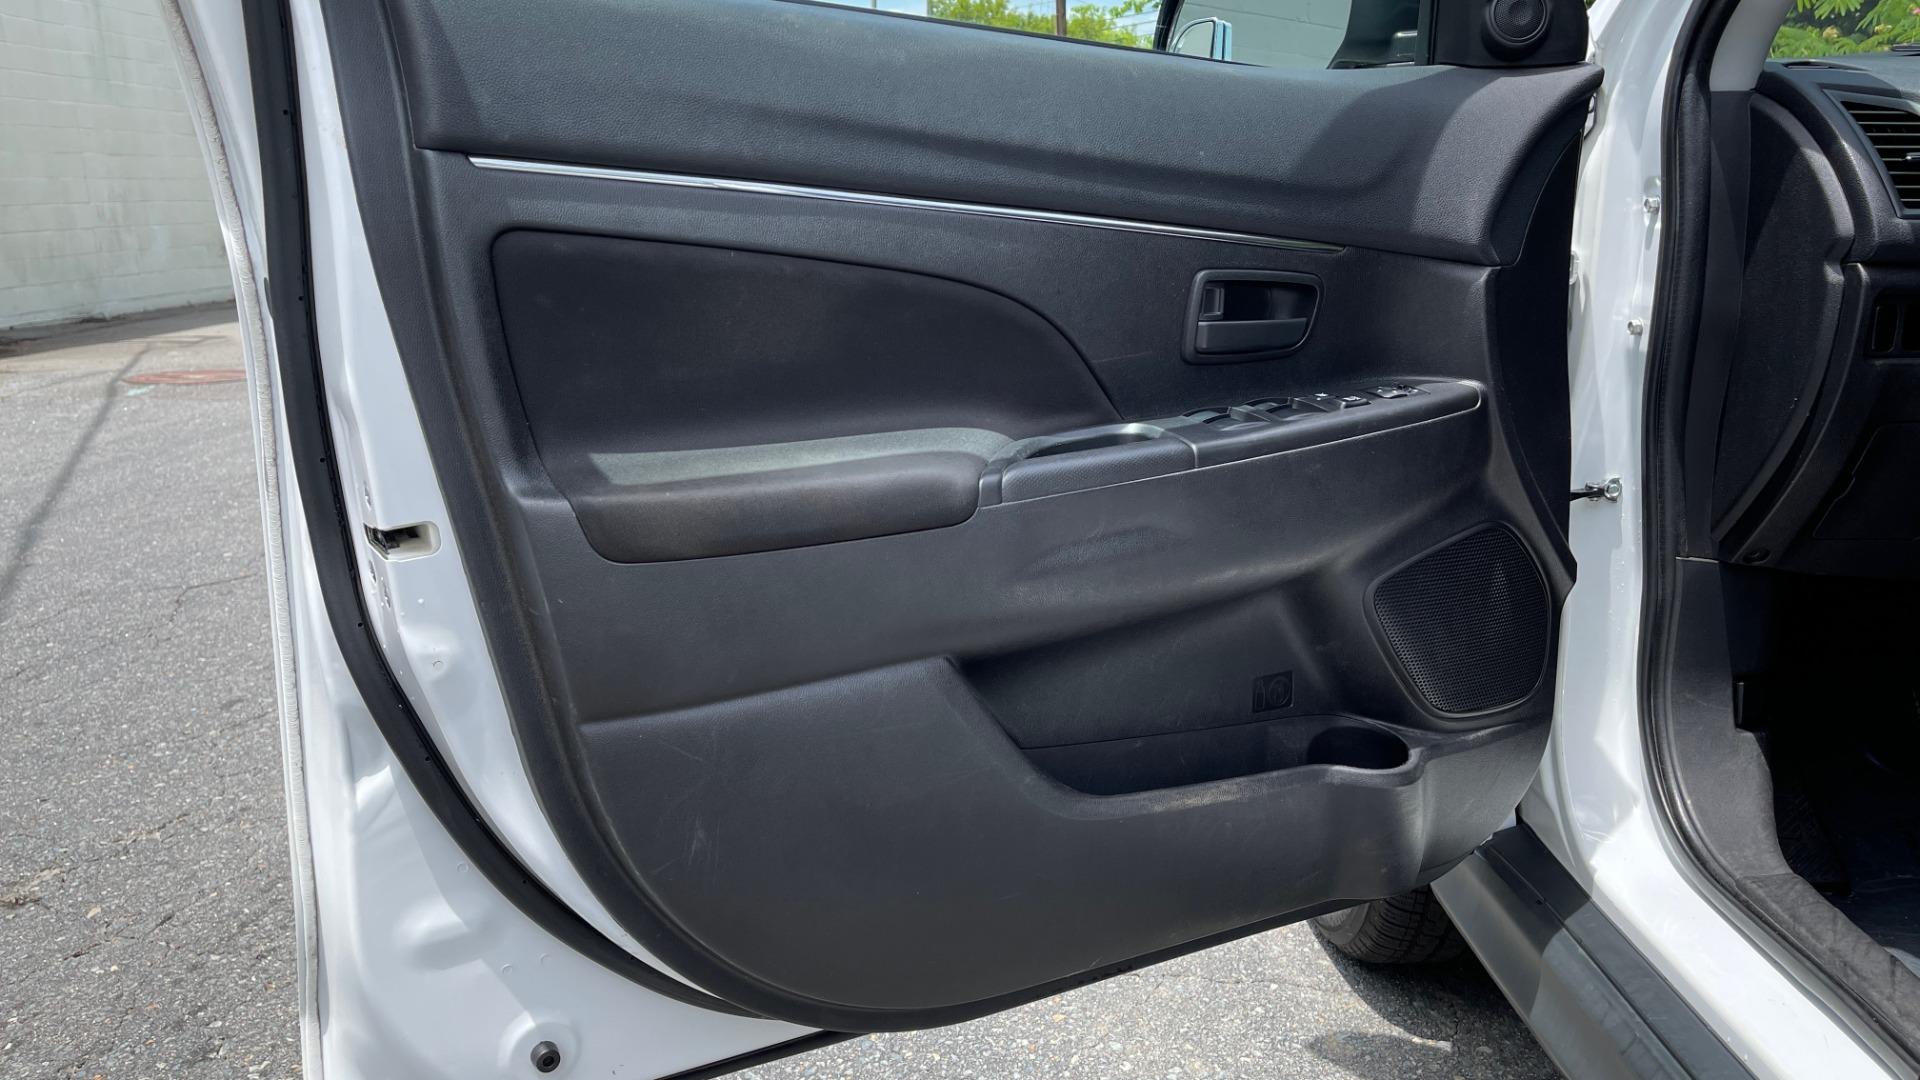 Used 2014 Mitsubishi OUTLANDER SPORT ES 2WD / 2.0L / CVT TRANS / 18IN WHEELS / 31MPG for sale $8,495 at Formula Imports in Charlotte NC 28227 23